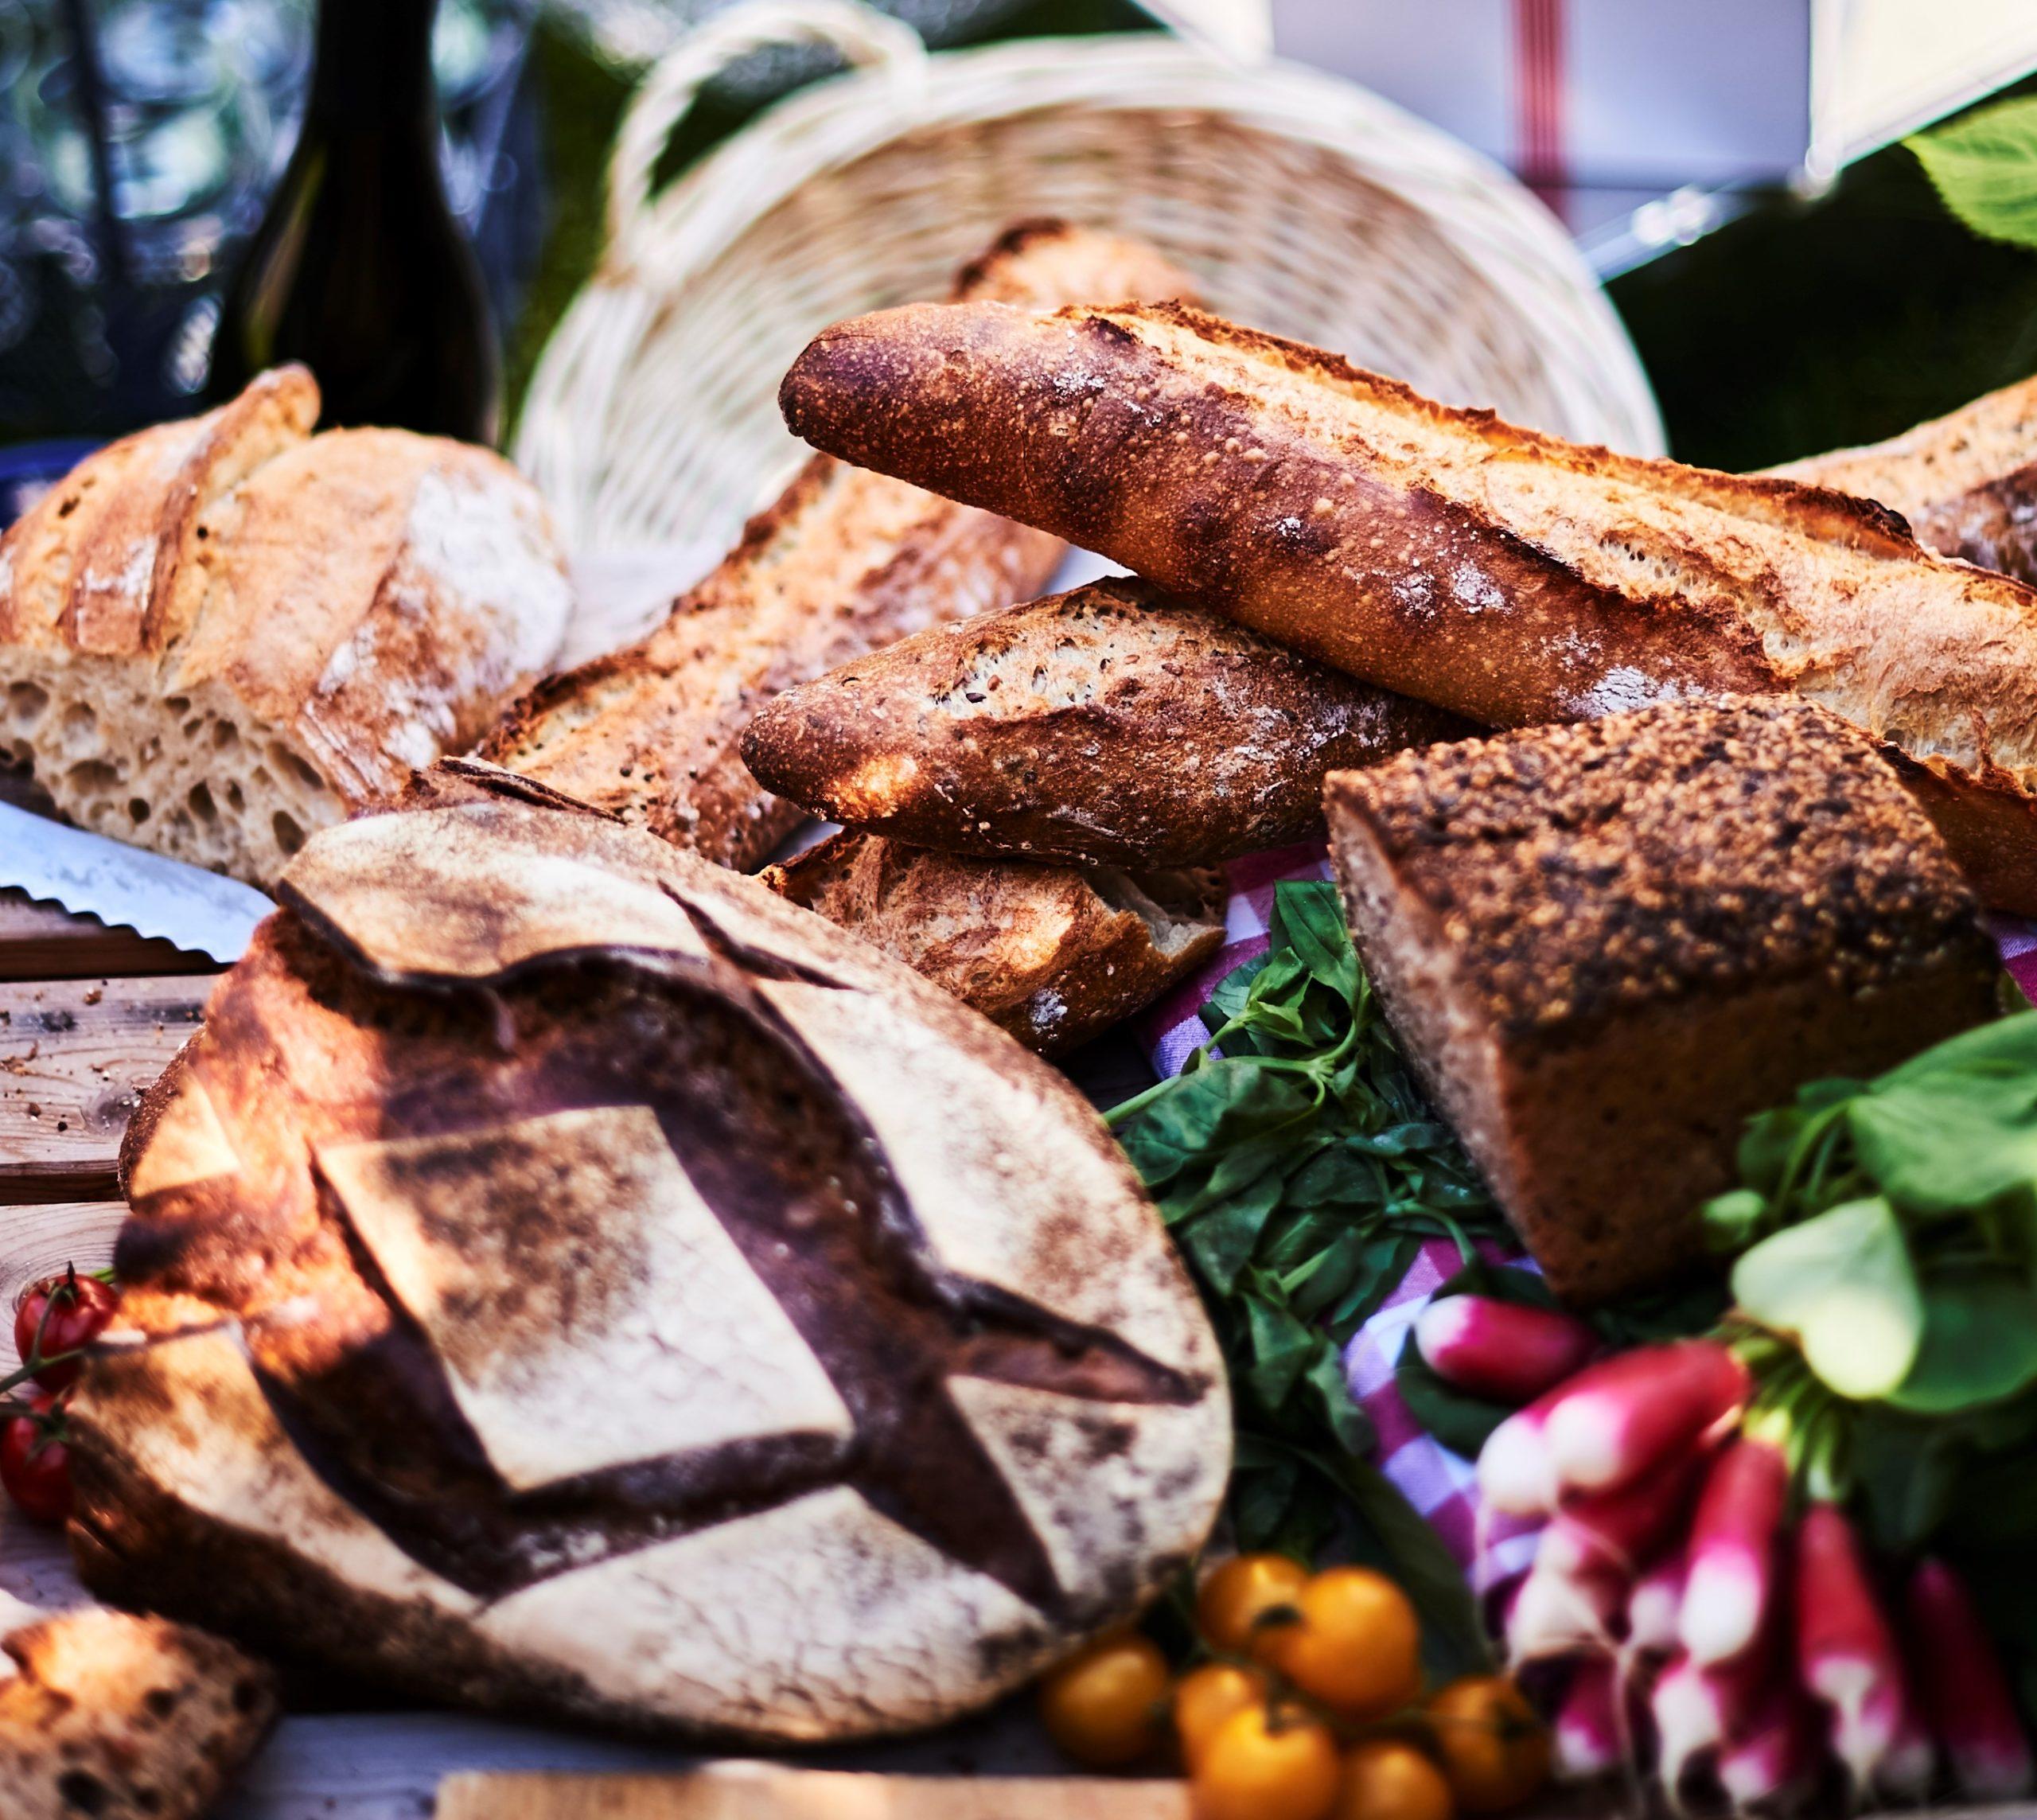 Les pains de La Briacine, Saint-Briac